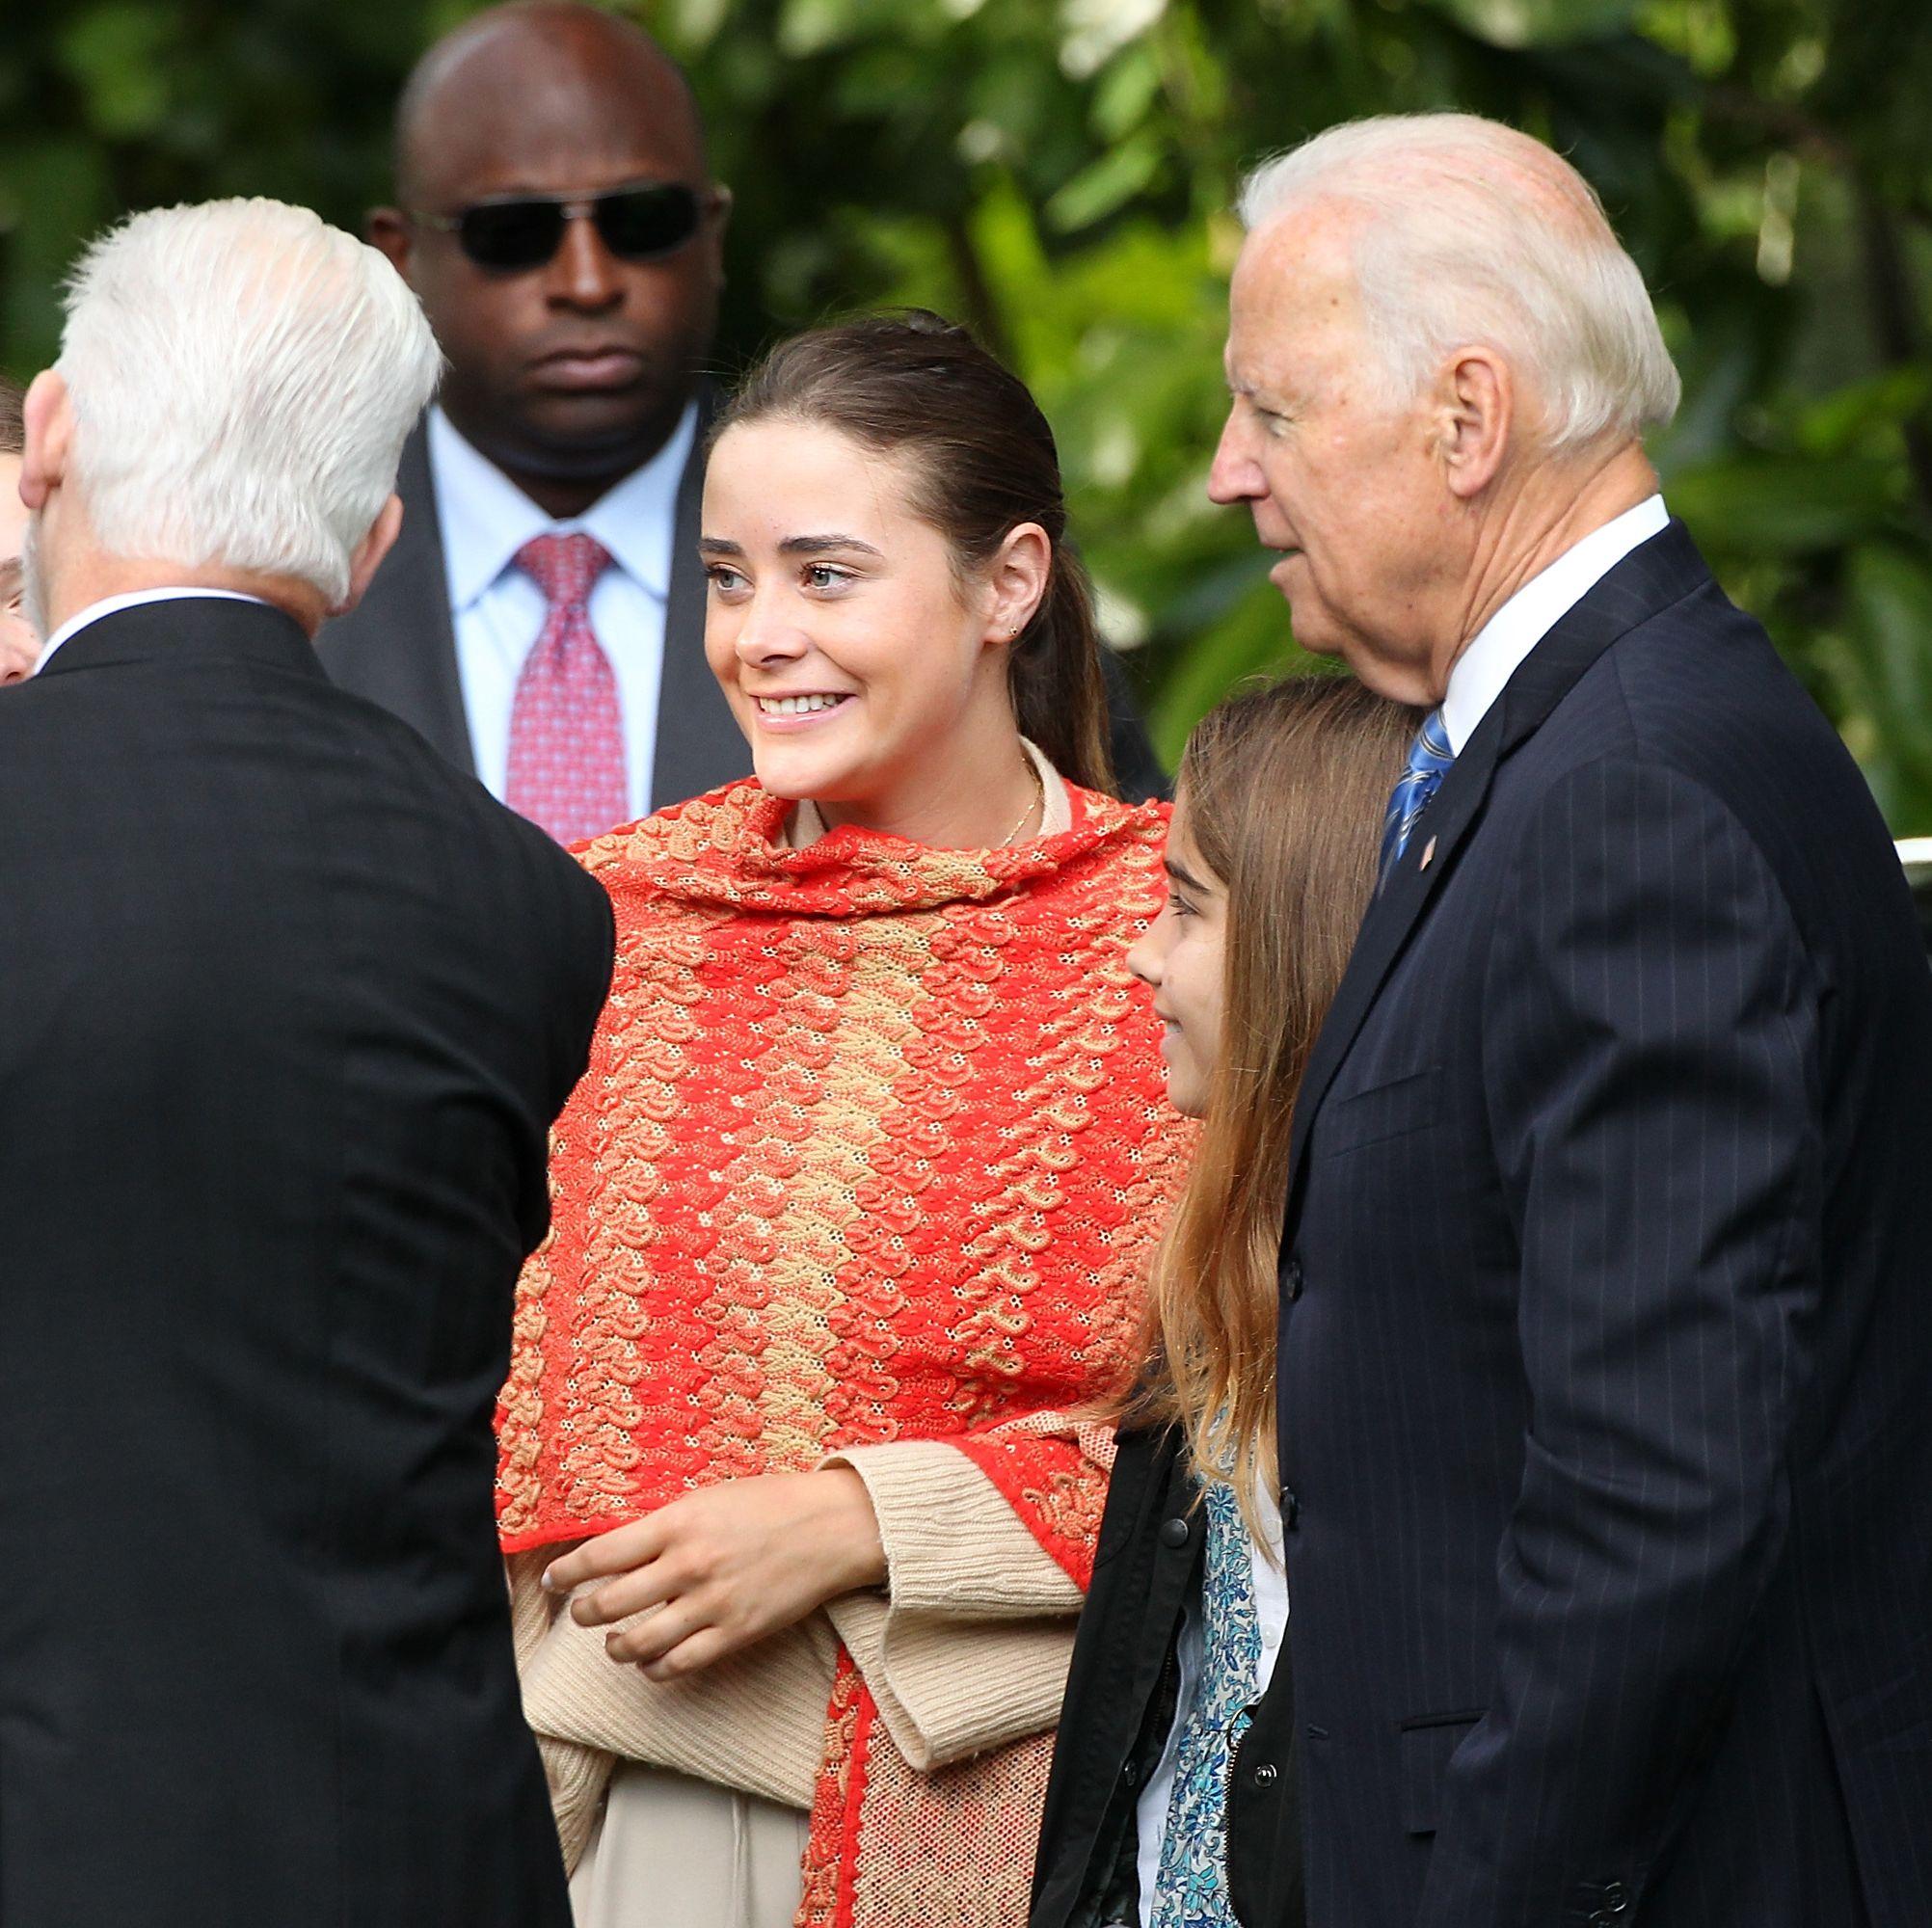 Joe Biden Grandson Age Images